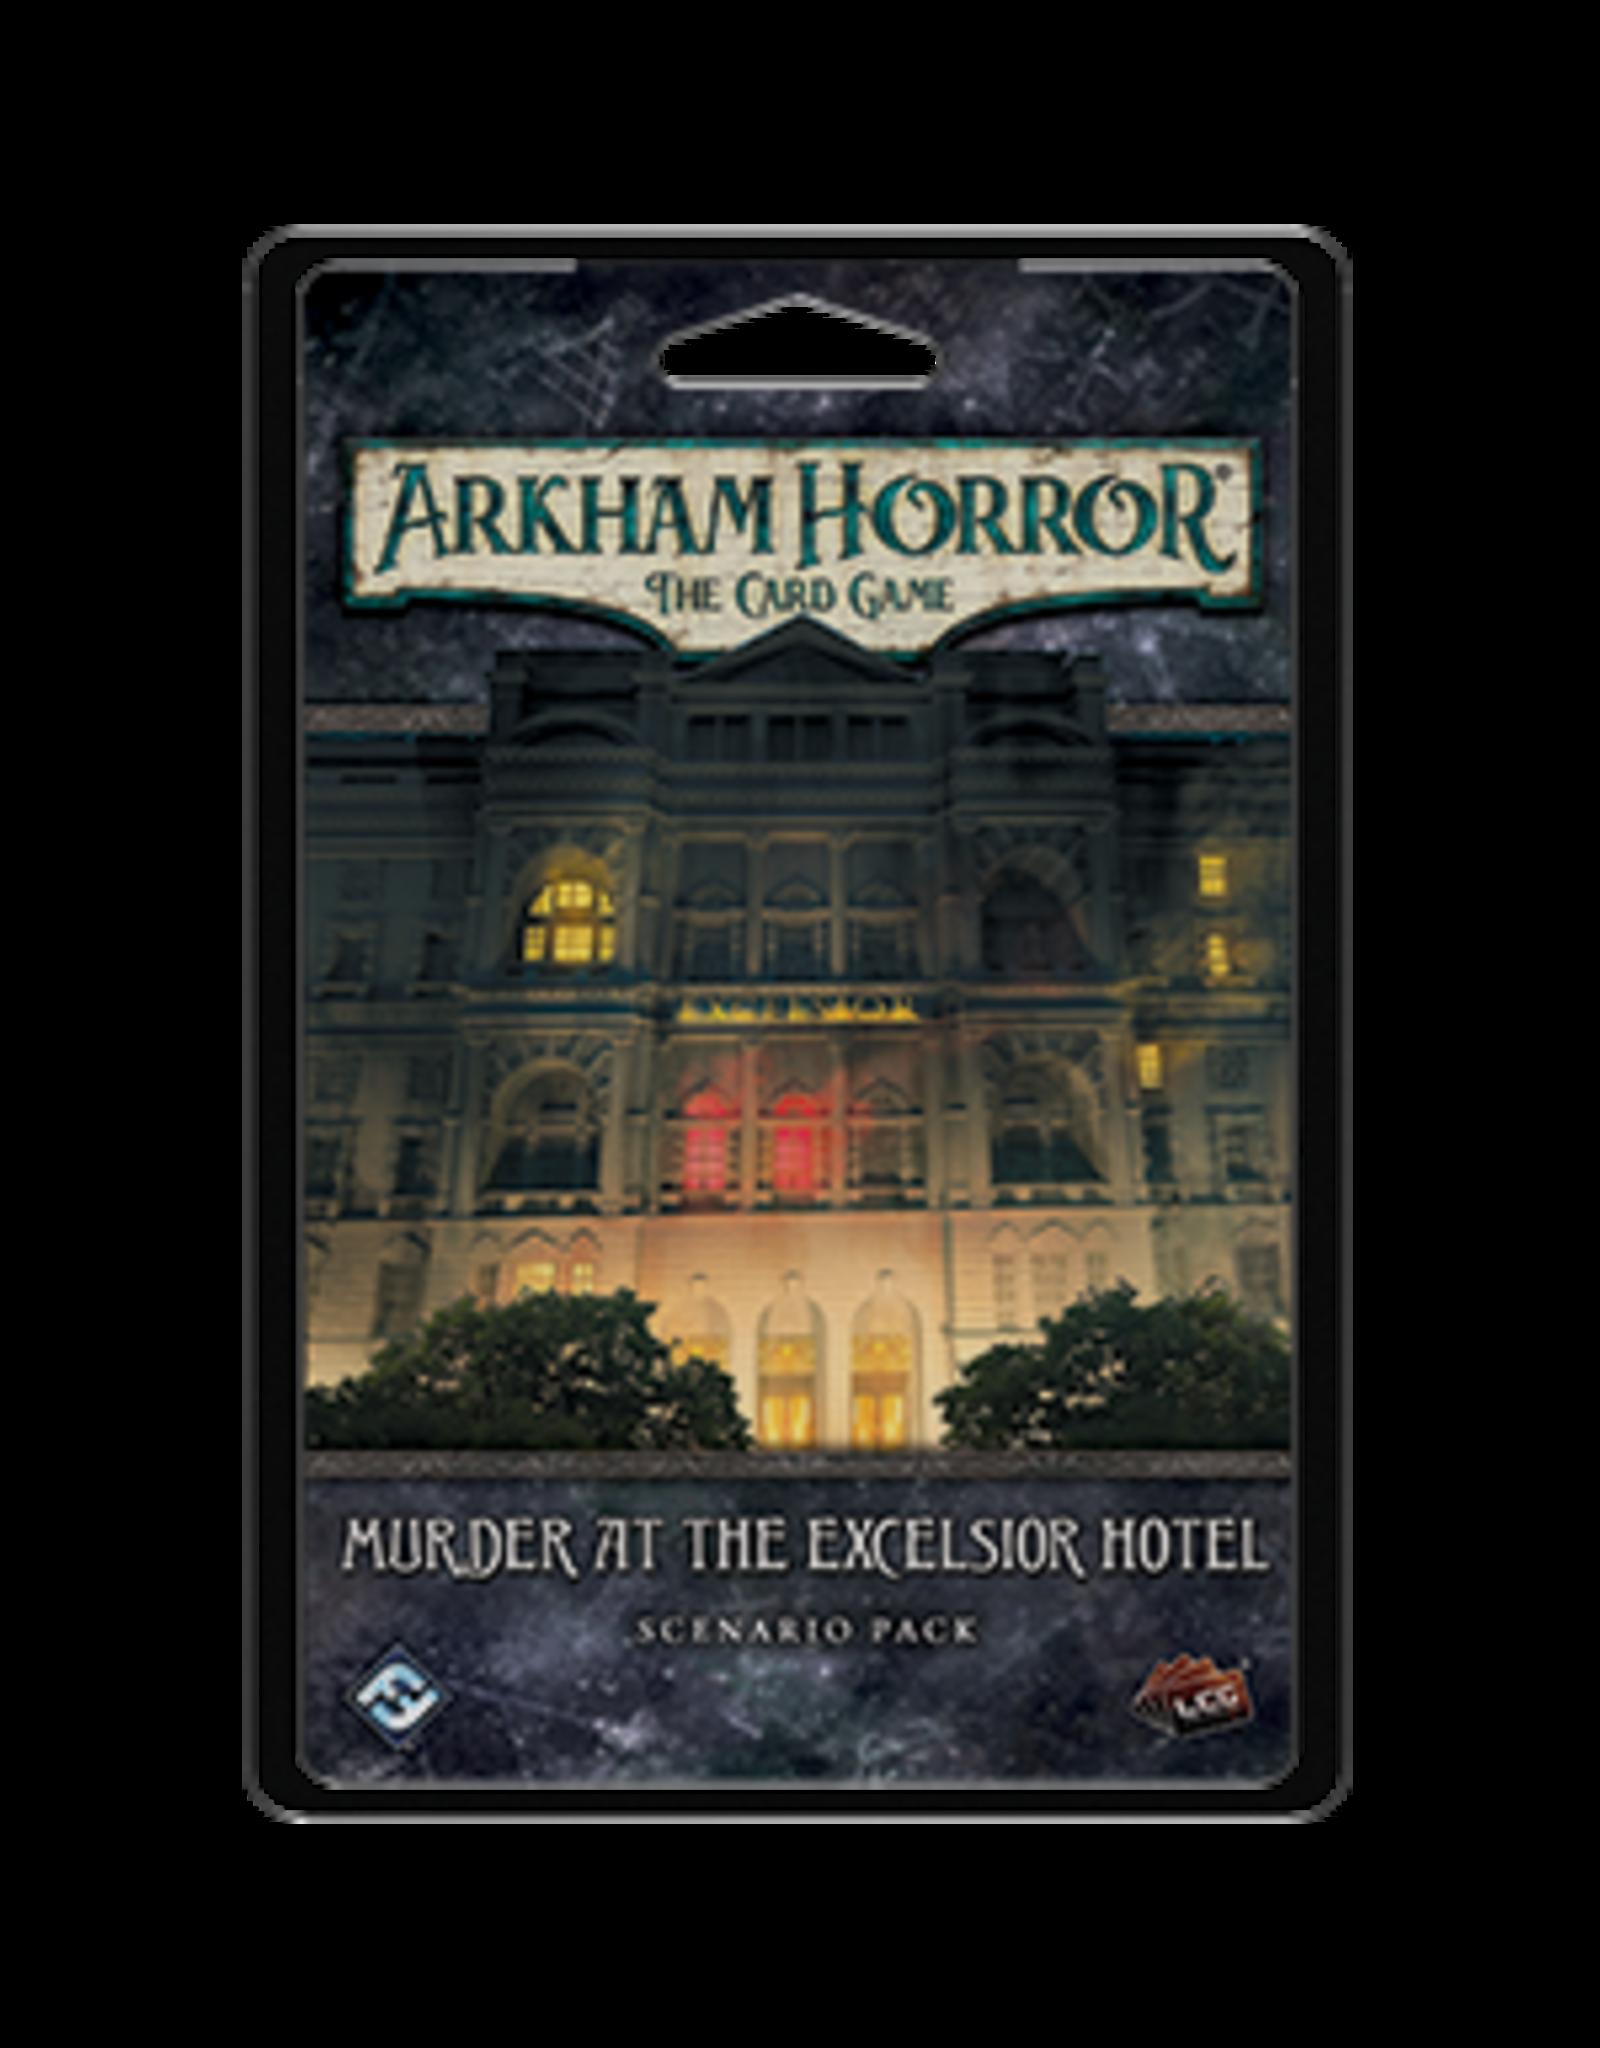 Arkham Horror LCG: Murder at the Excelsior Hotel Scenario Pack